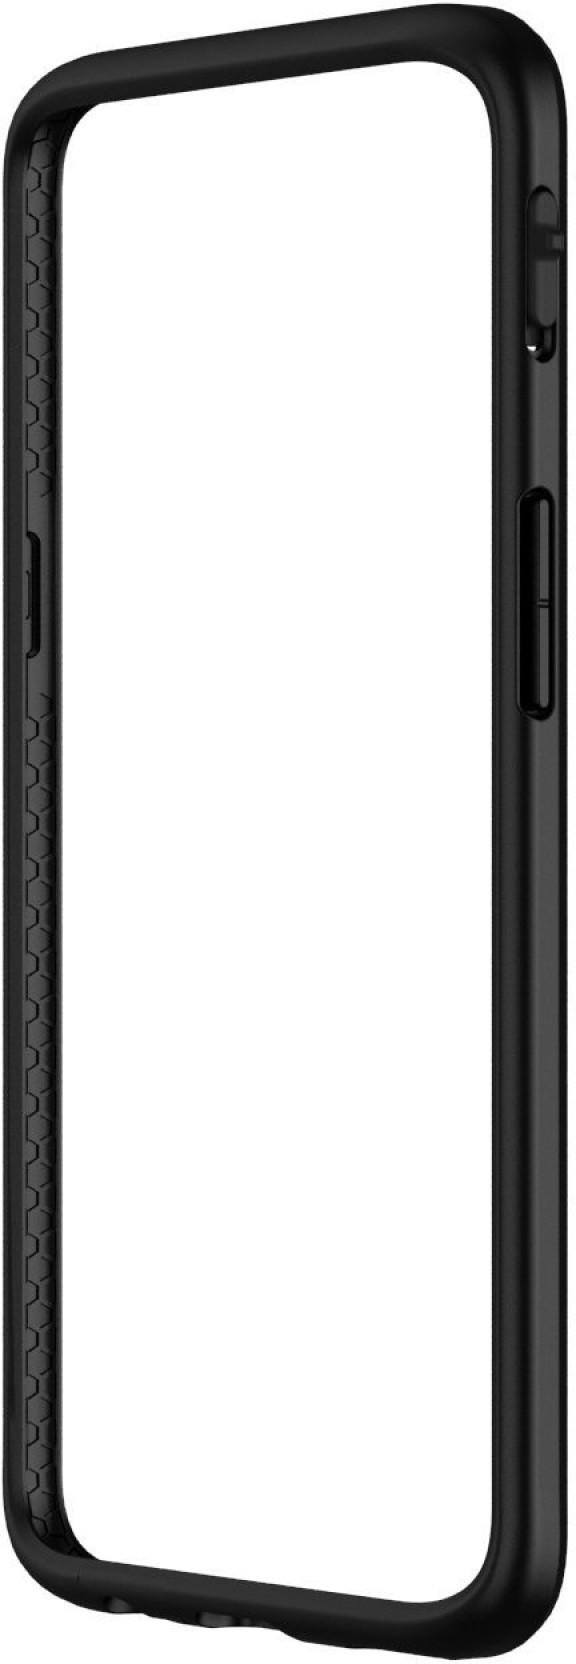 innovative design 9ffc7 3ab11 Rhino Shield Bumper Case for OnePlus 5 - Rhino Shield : Flipkart.com